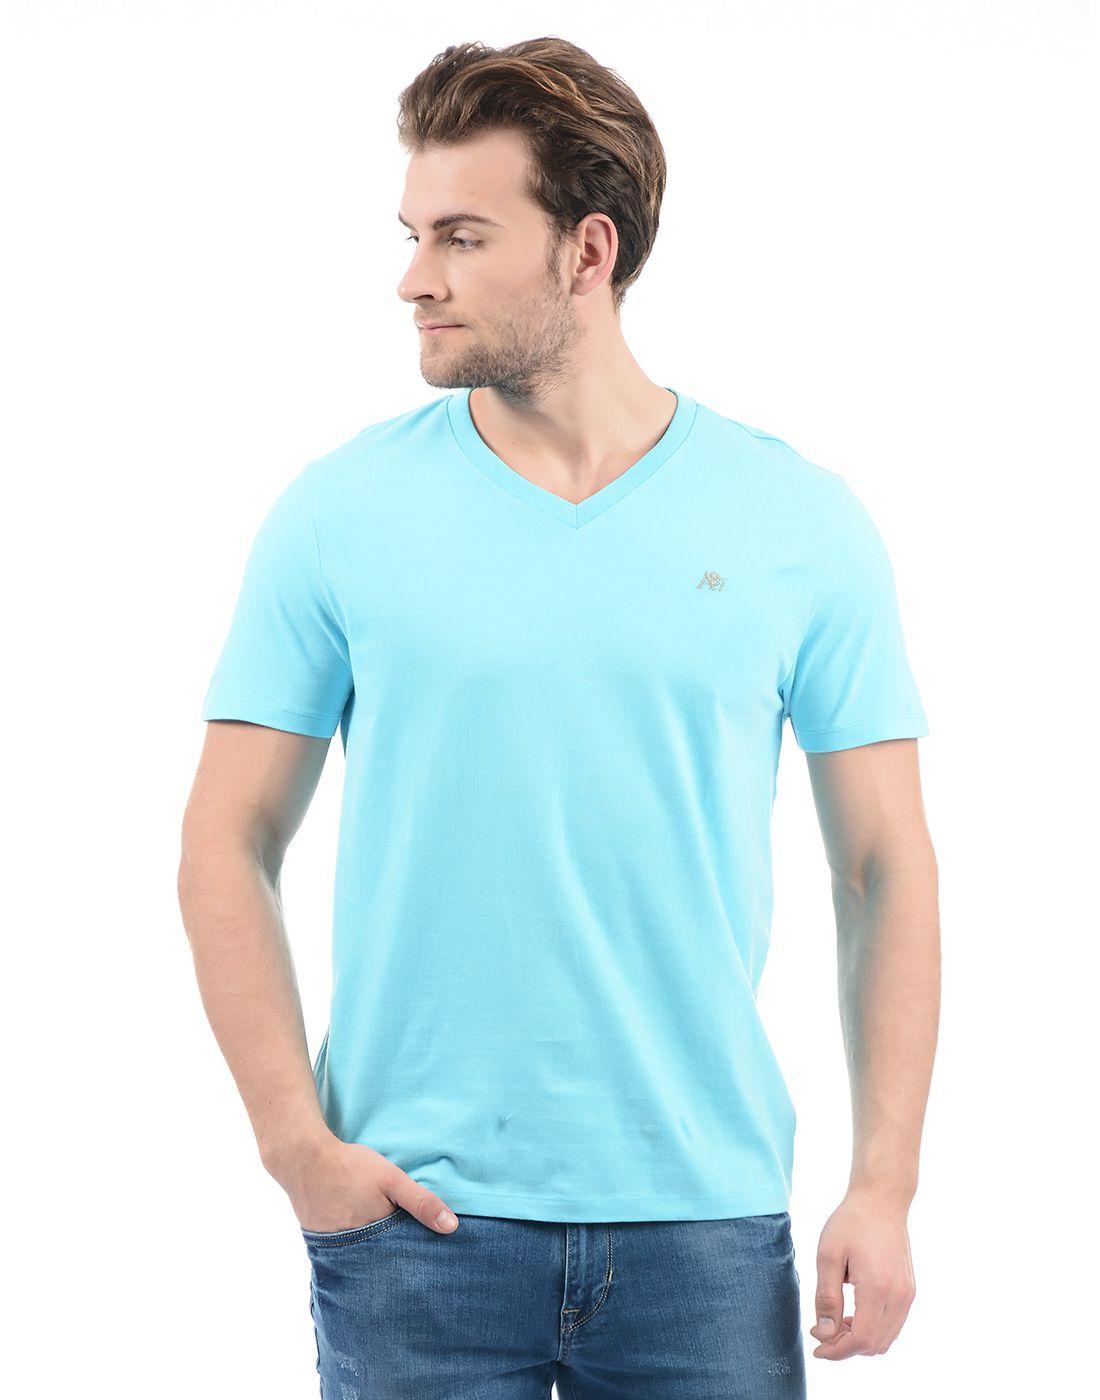 Aeropostale Blue V-Neck T-Shirt